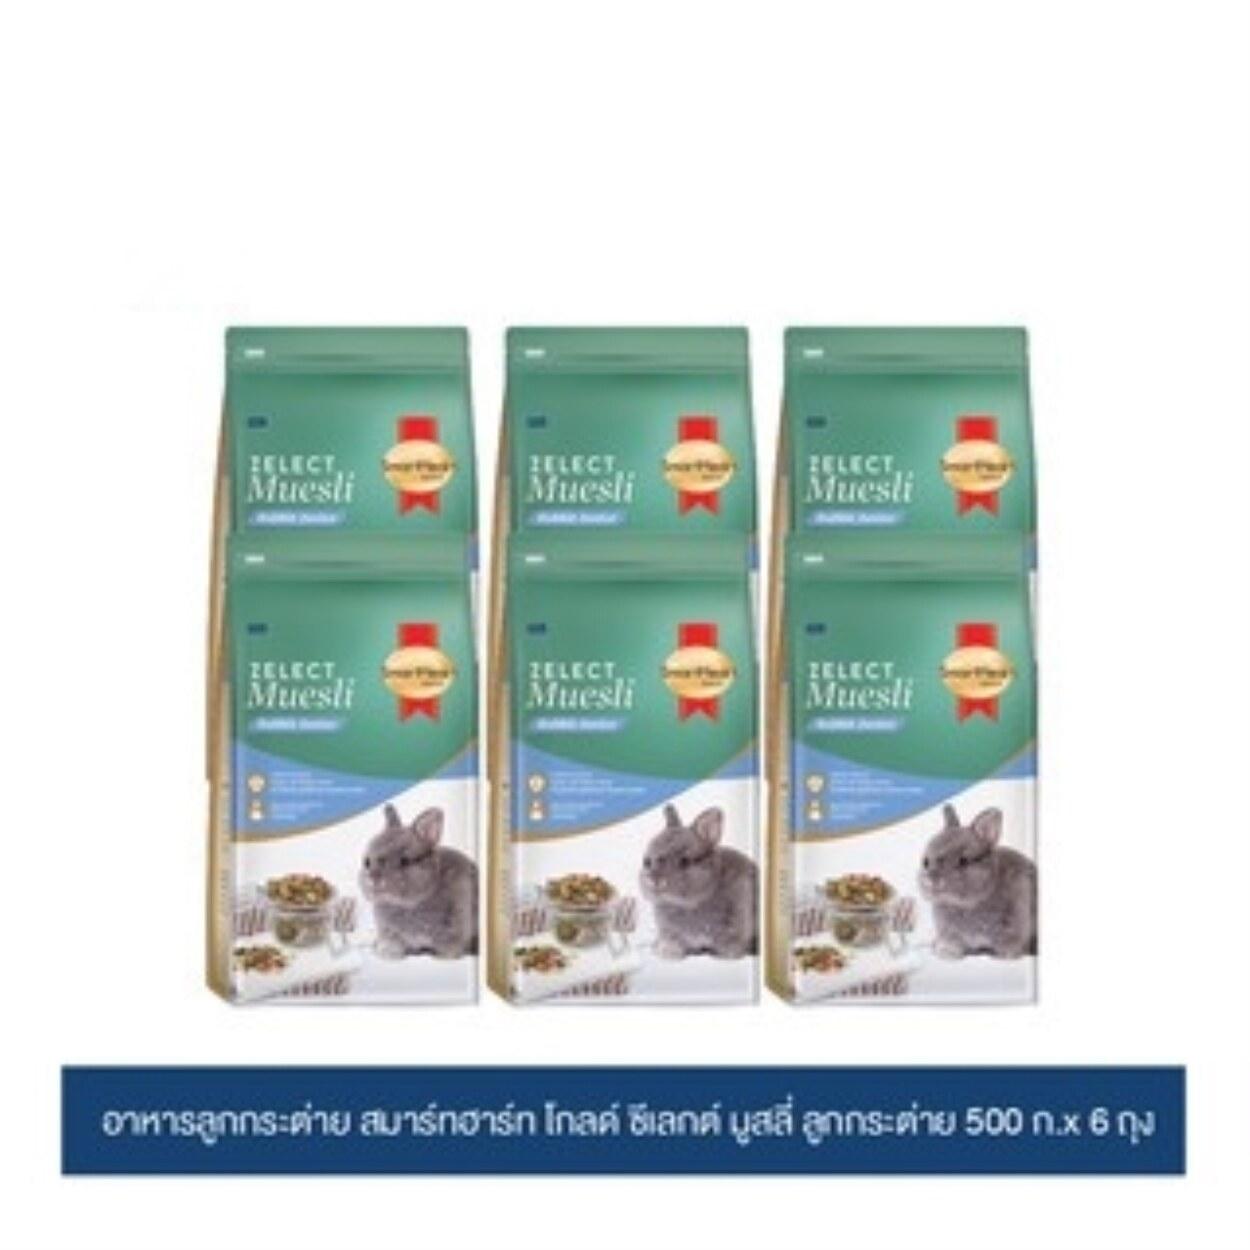 vitakraft สมาร์ทฮาร์ท โกลด์ ซีเลกต์ มูสลี่ อาหารลูกกระต่าย 500 กรัม x 6 ถุง / SmartHeart Gold Zelect Muesli Junior 500 G x 6